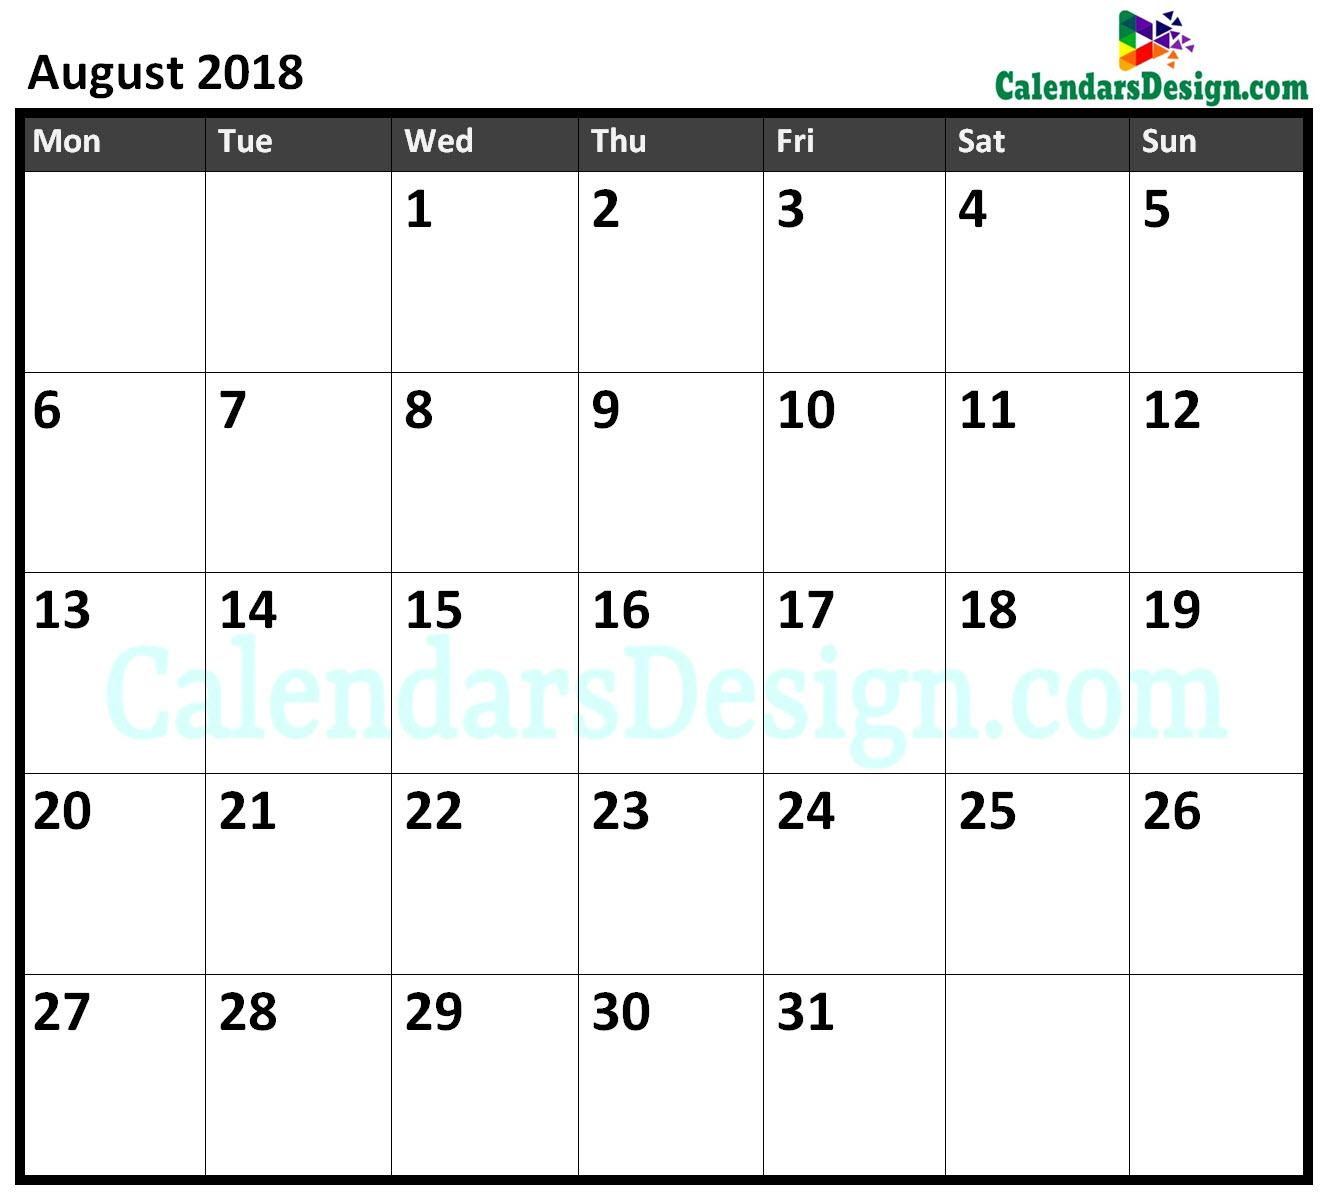 August 2018 Calendar Excel